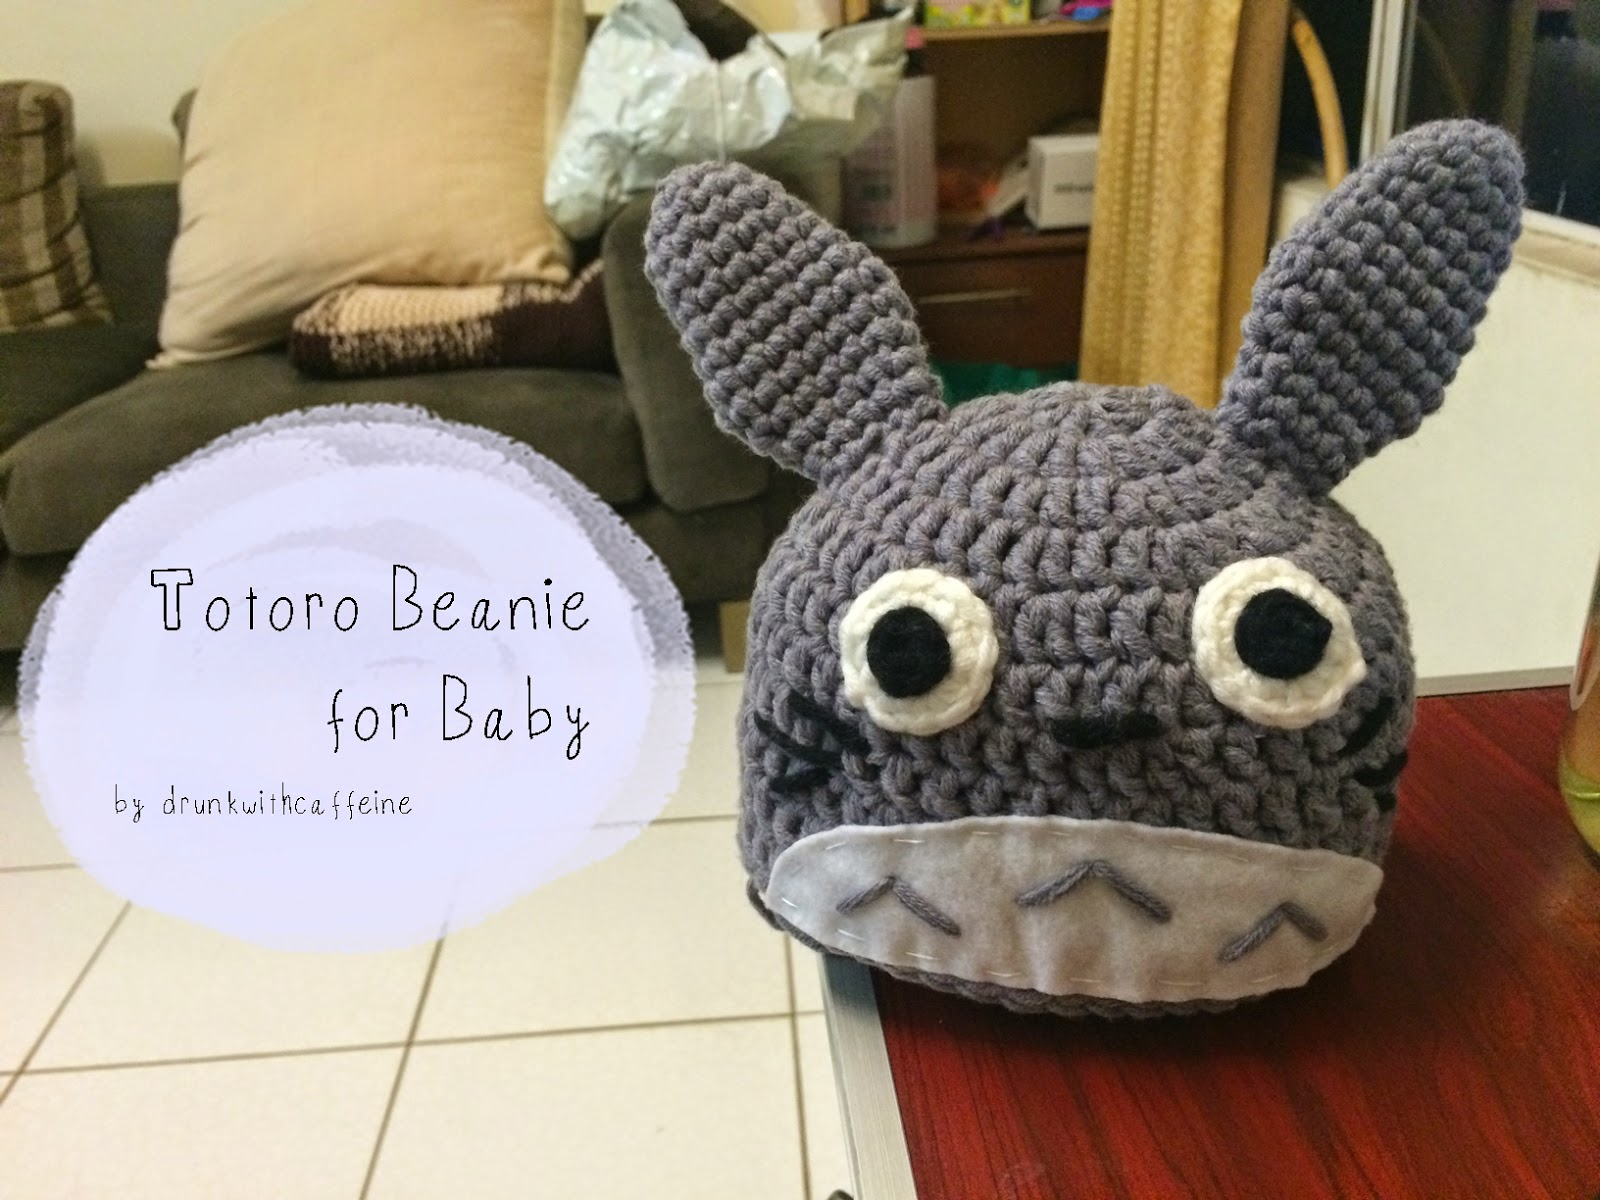 Crochet Pattern Totoro Hat : Drunk with Caffeine: Crochet Pattern Totoro Beanie for ...